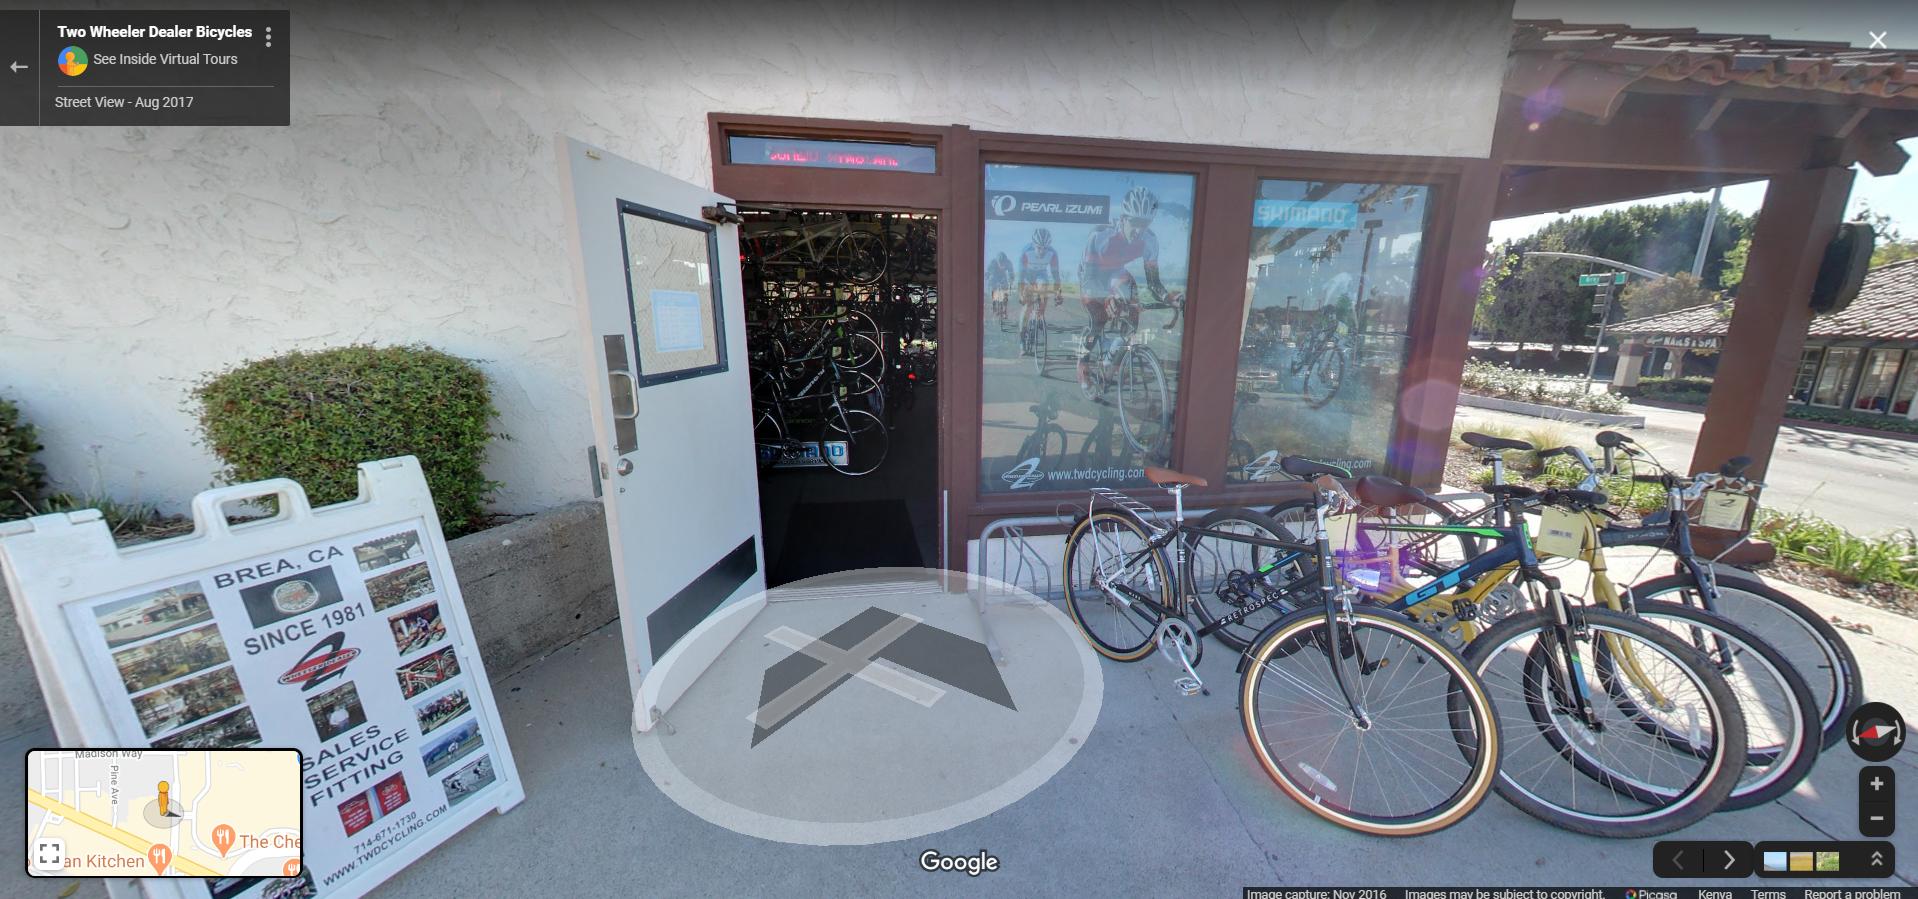 Two Wheeler Dealer Bicycles - Brea